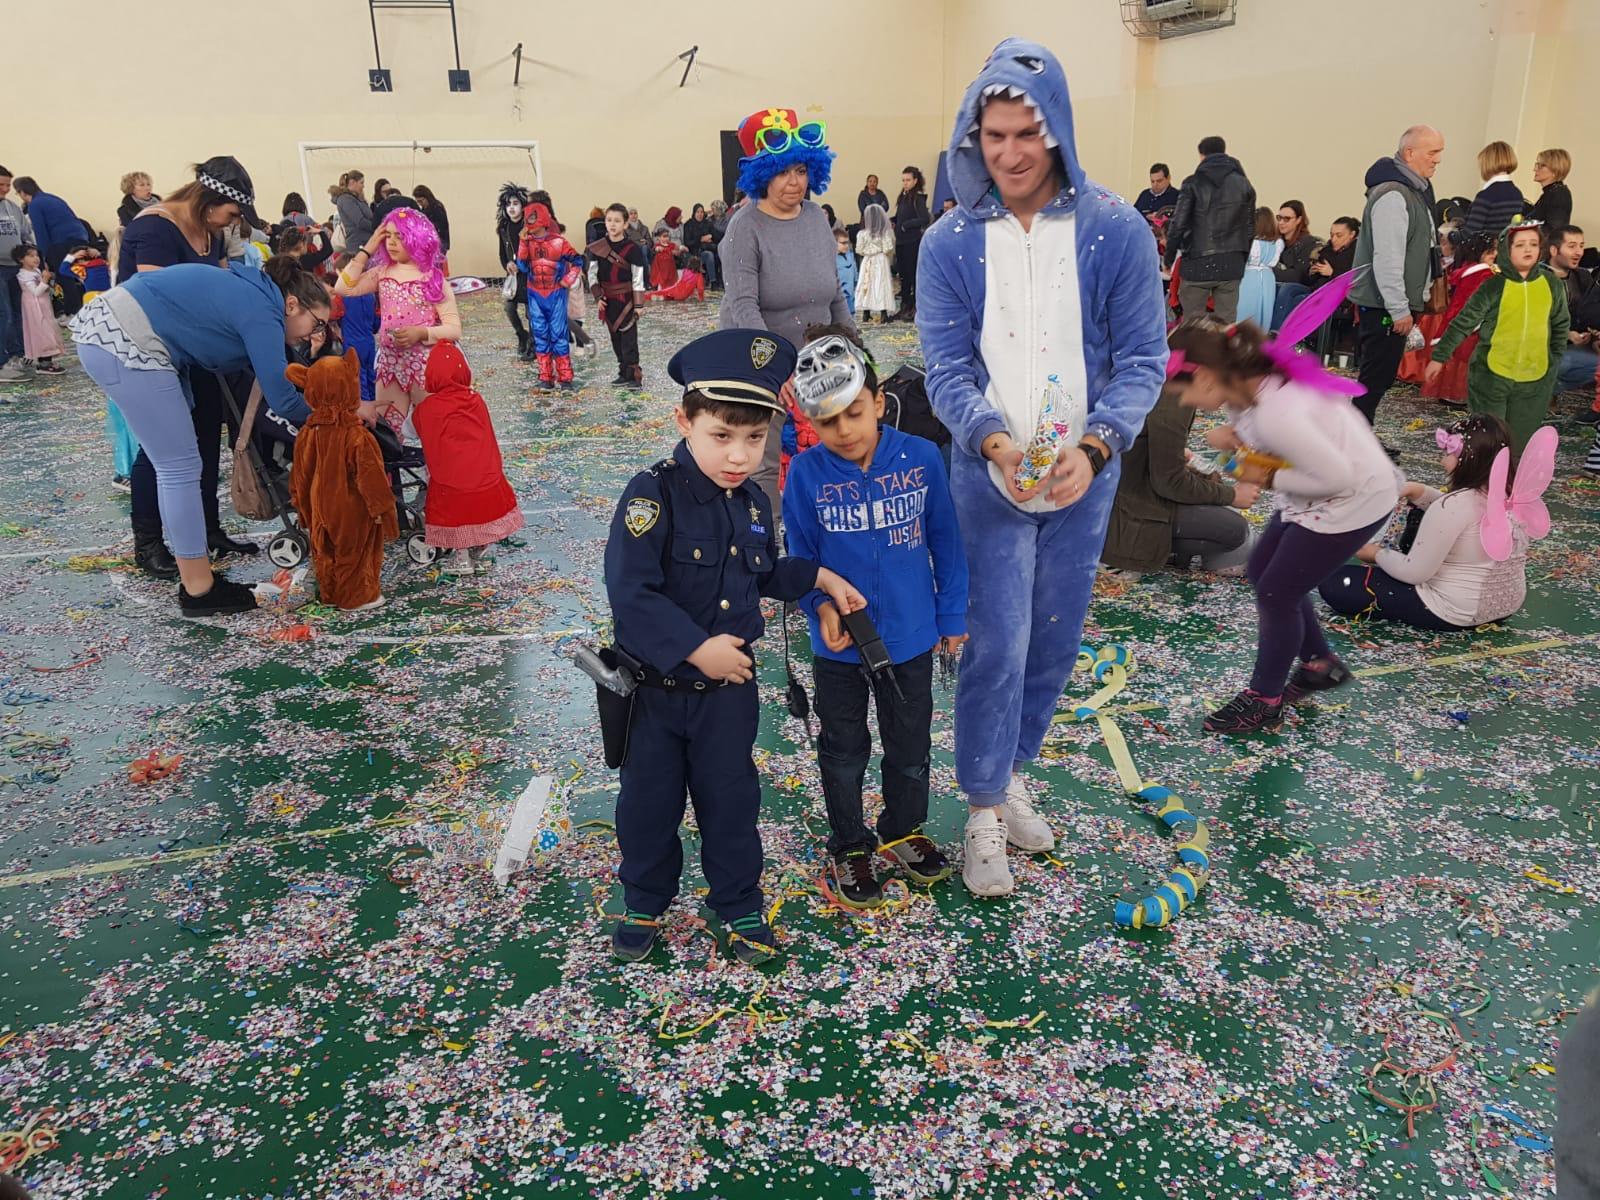 Baraonda Carnevale 2019 (4)